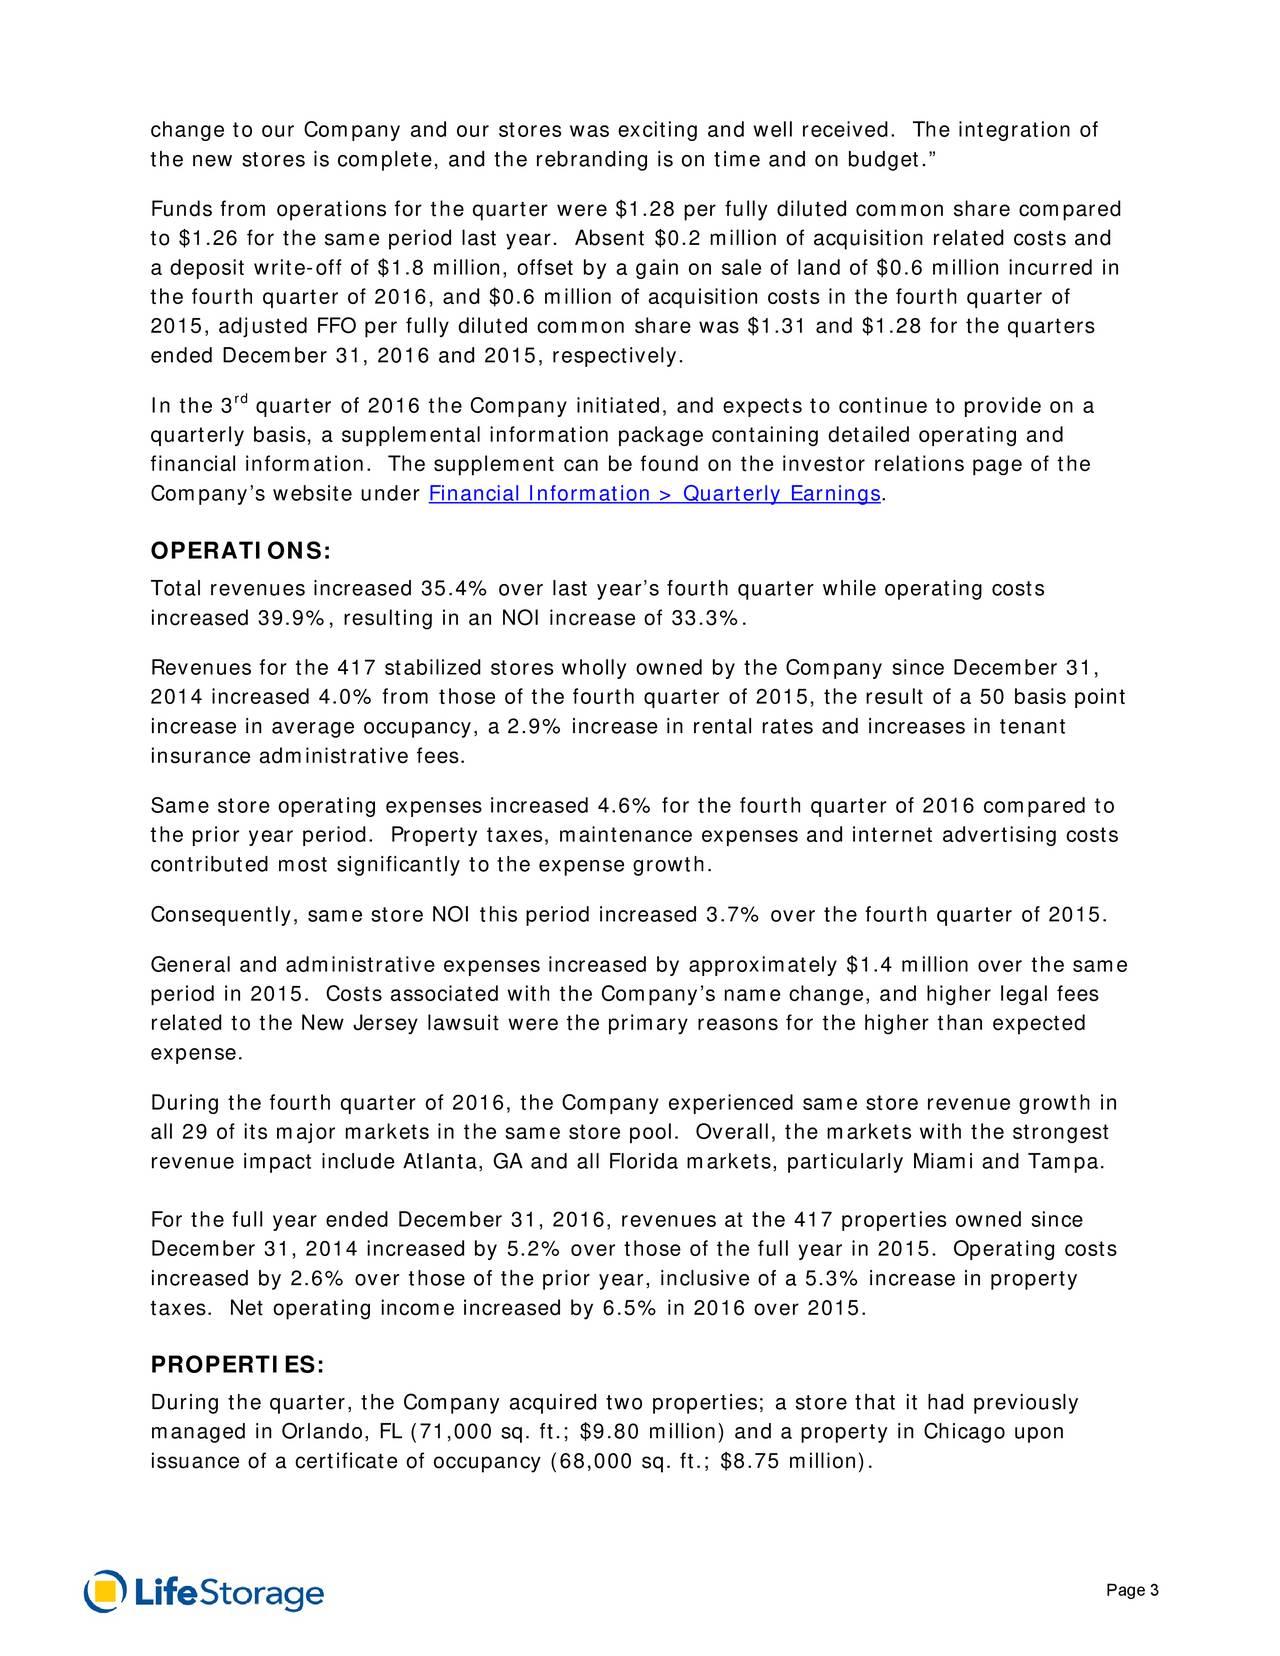 Life Storage, Inc. 2016 Q4 - Results